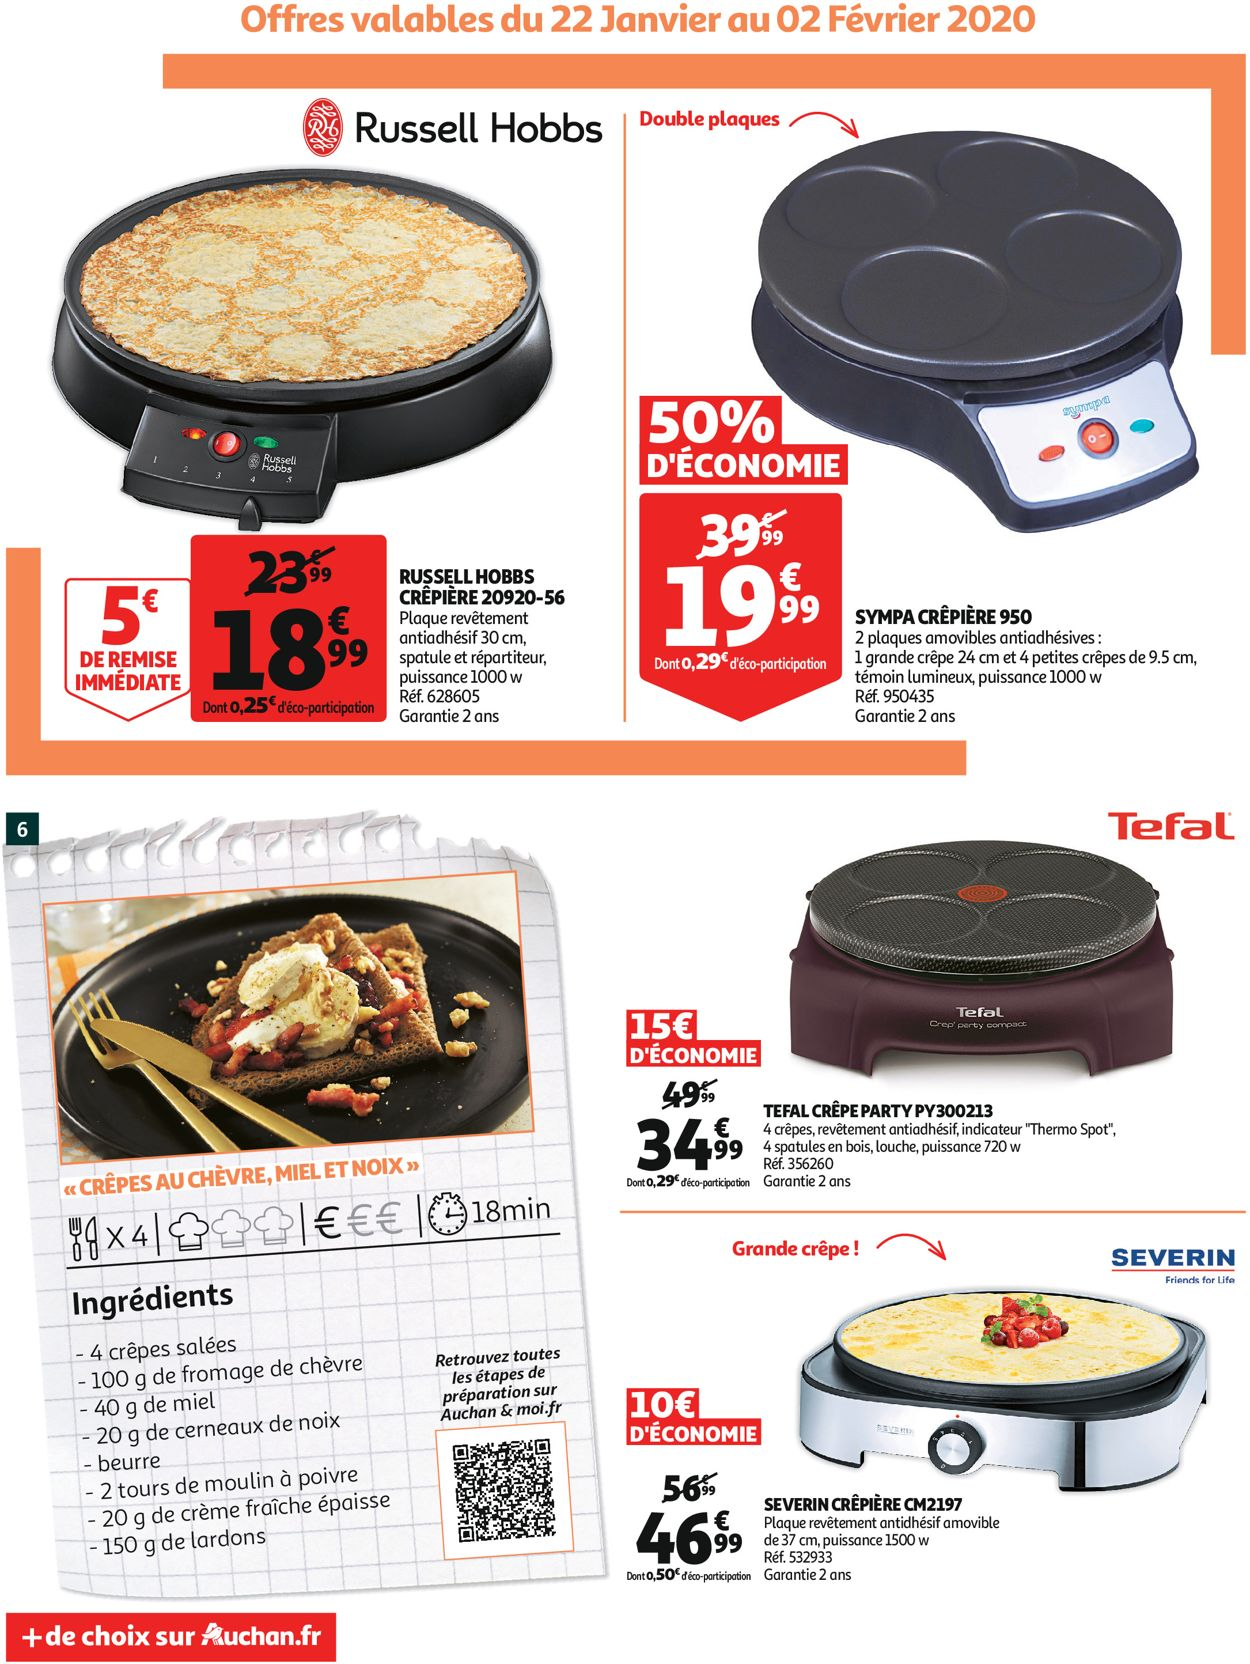 Auchan Catalogue - 22.01-28.01.2020 (Page 6)